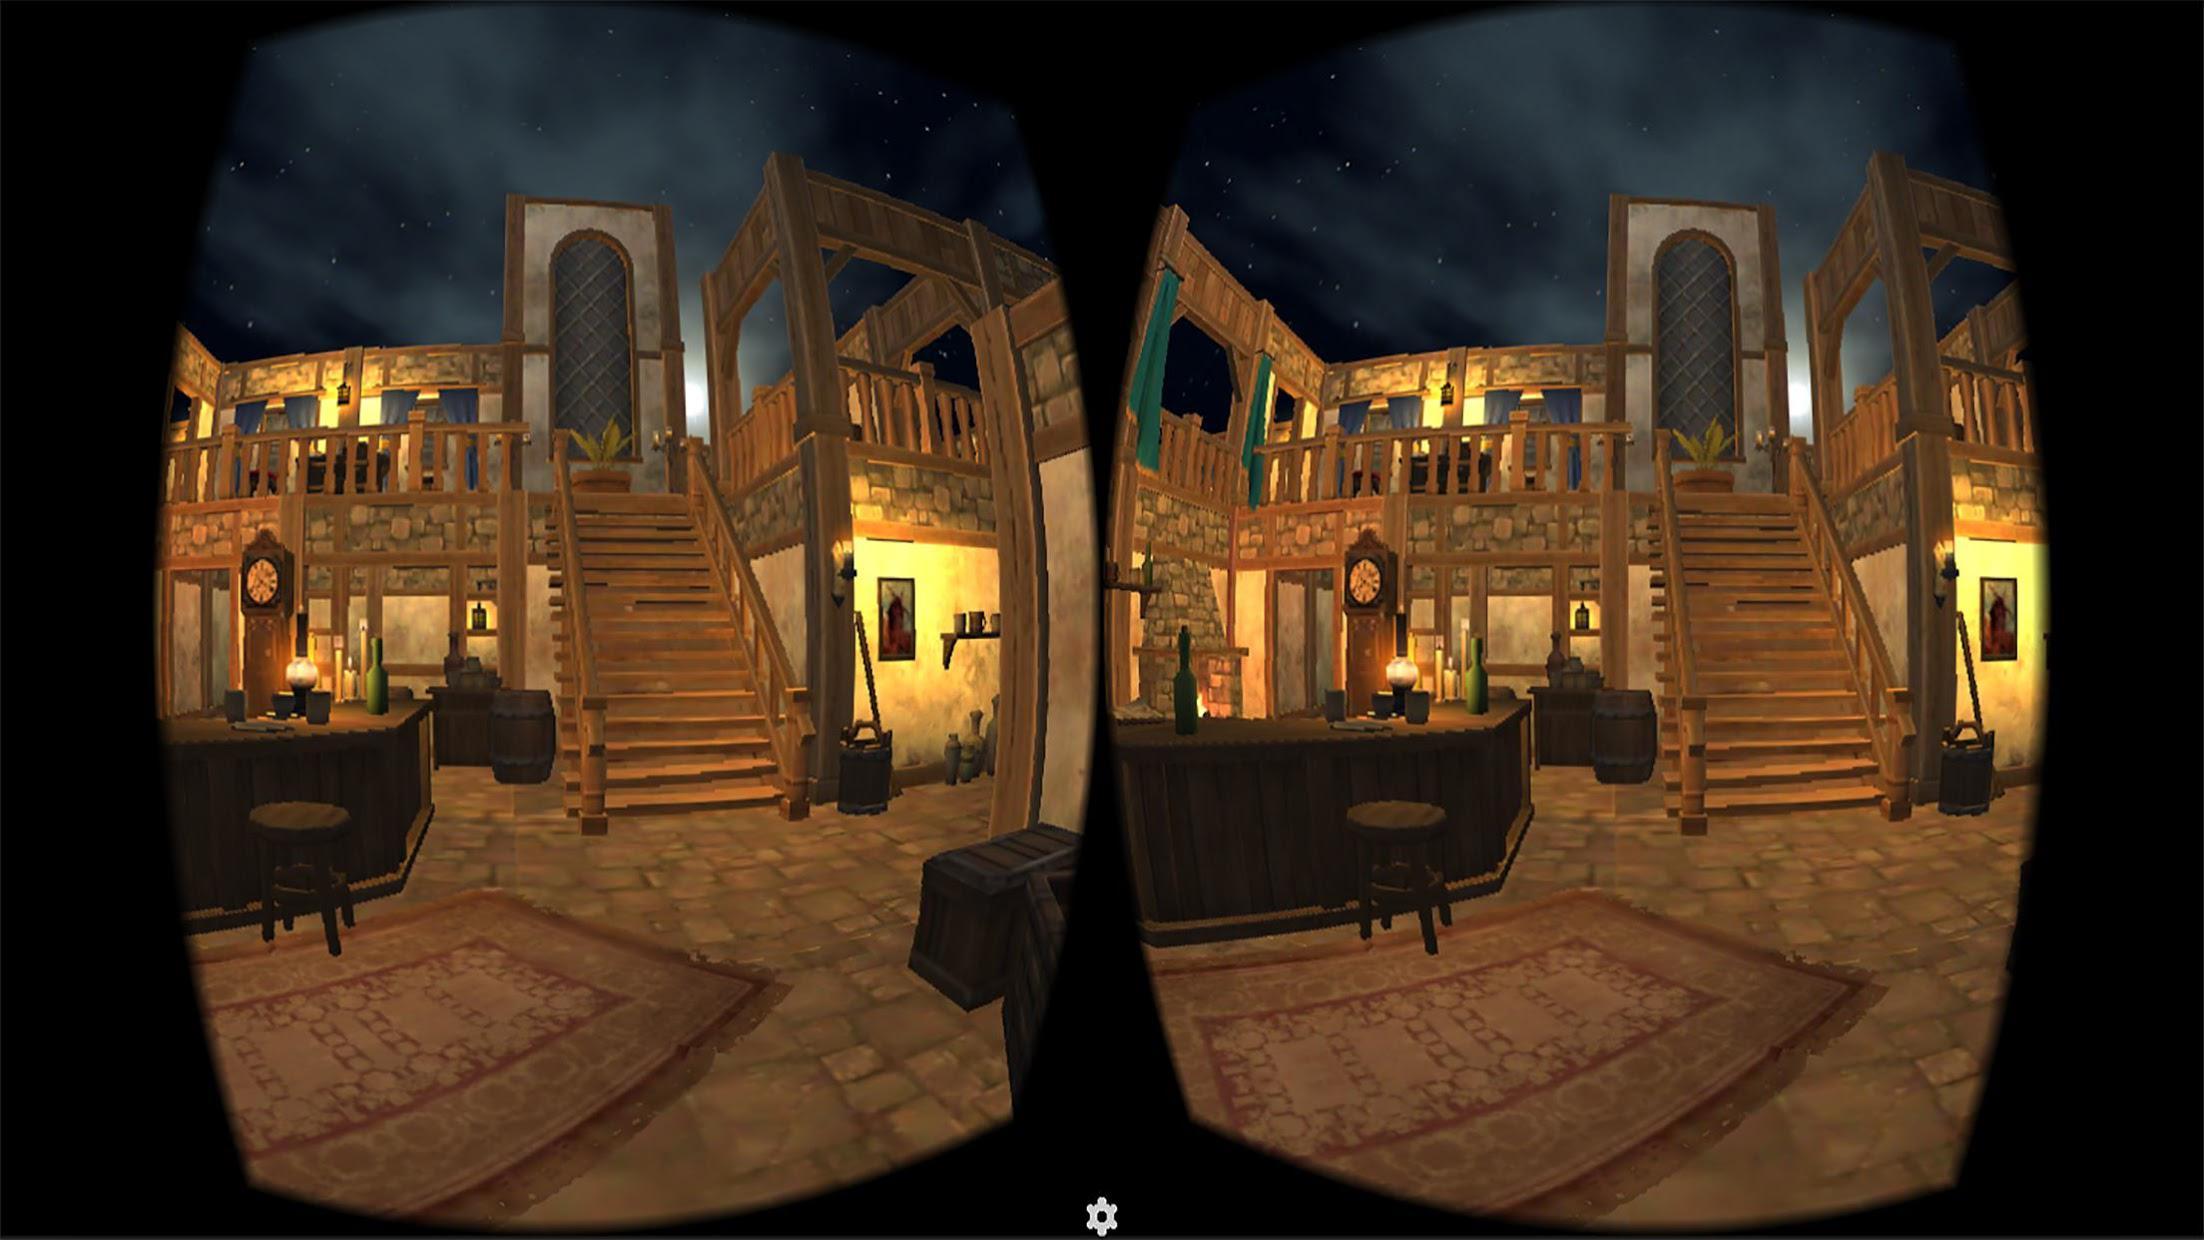 Cardboard Manor Environment 游戏截图1